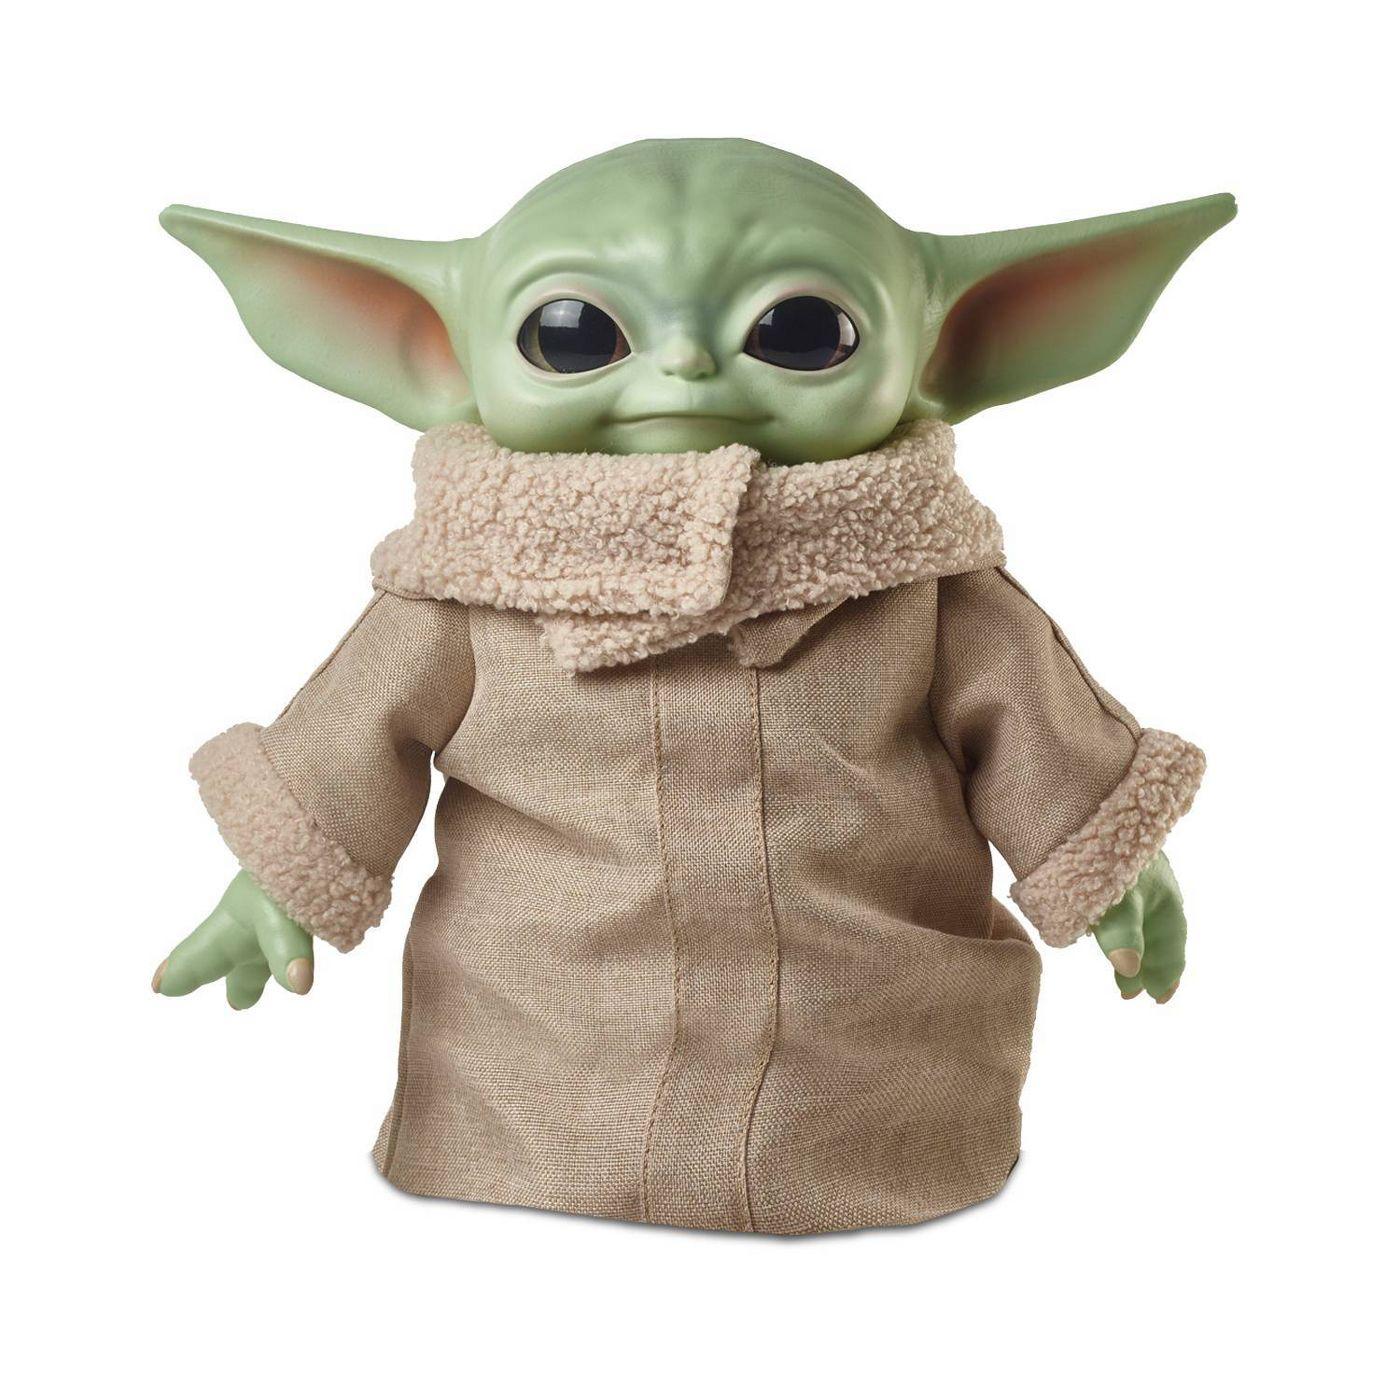 Toy Baby Yoda Pre order